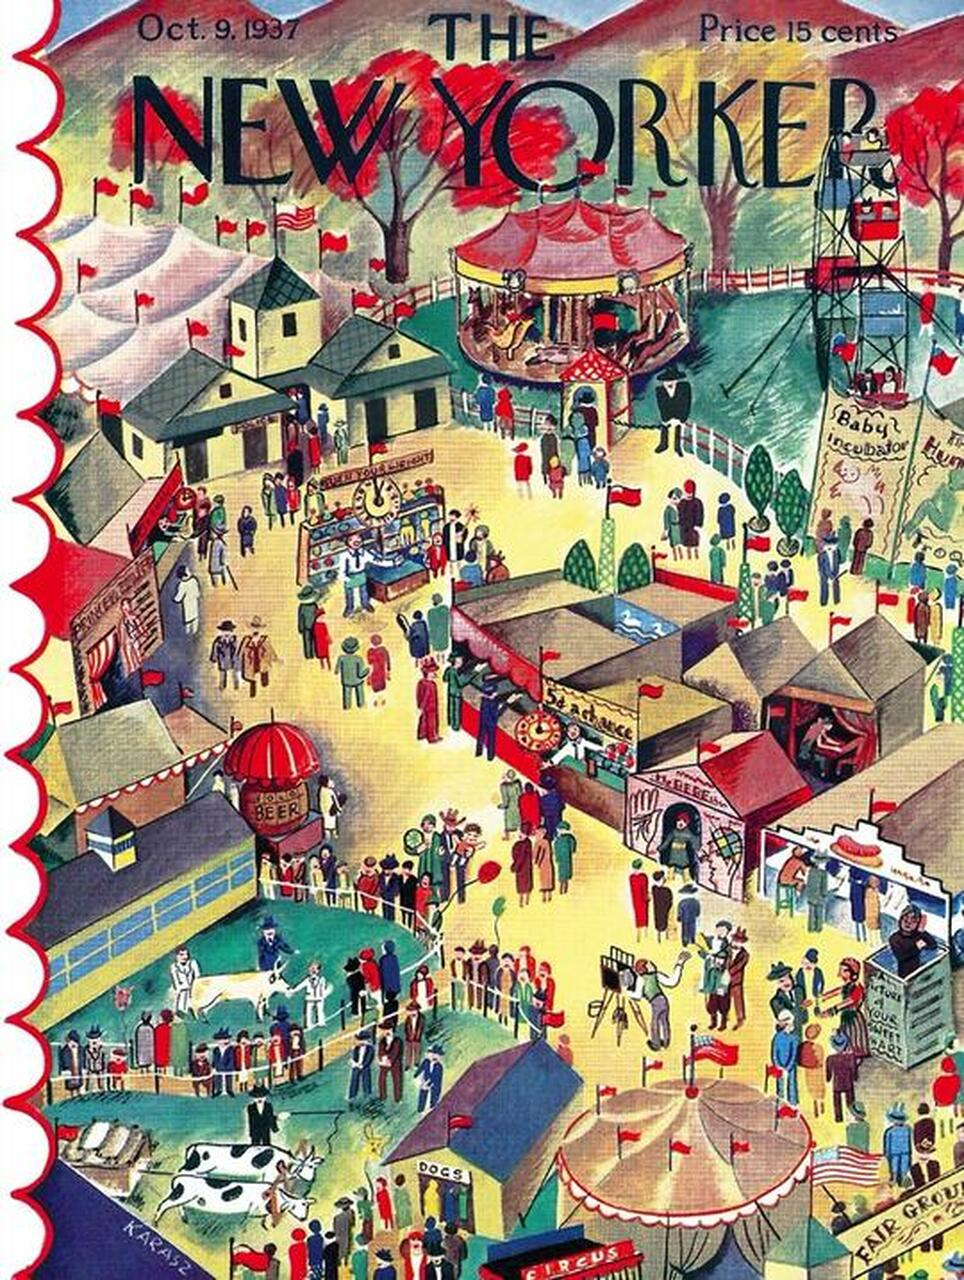 State Fair - 1000 pieces